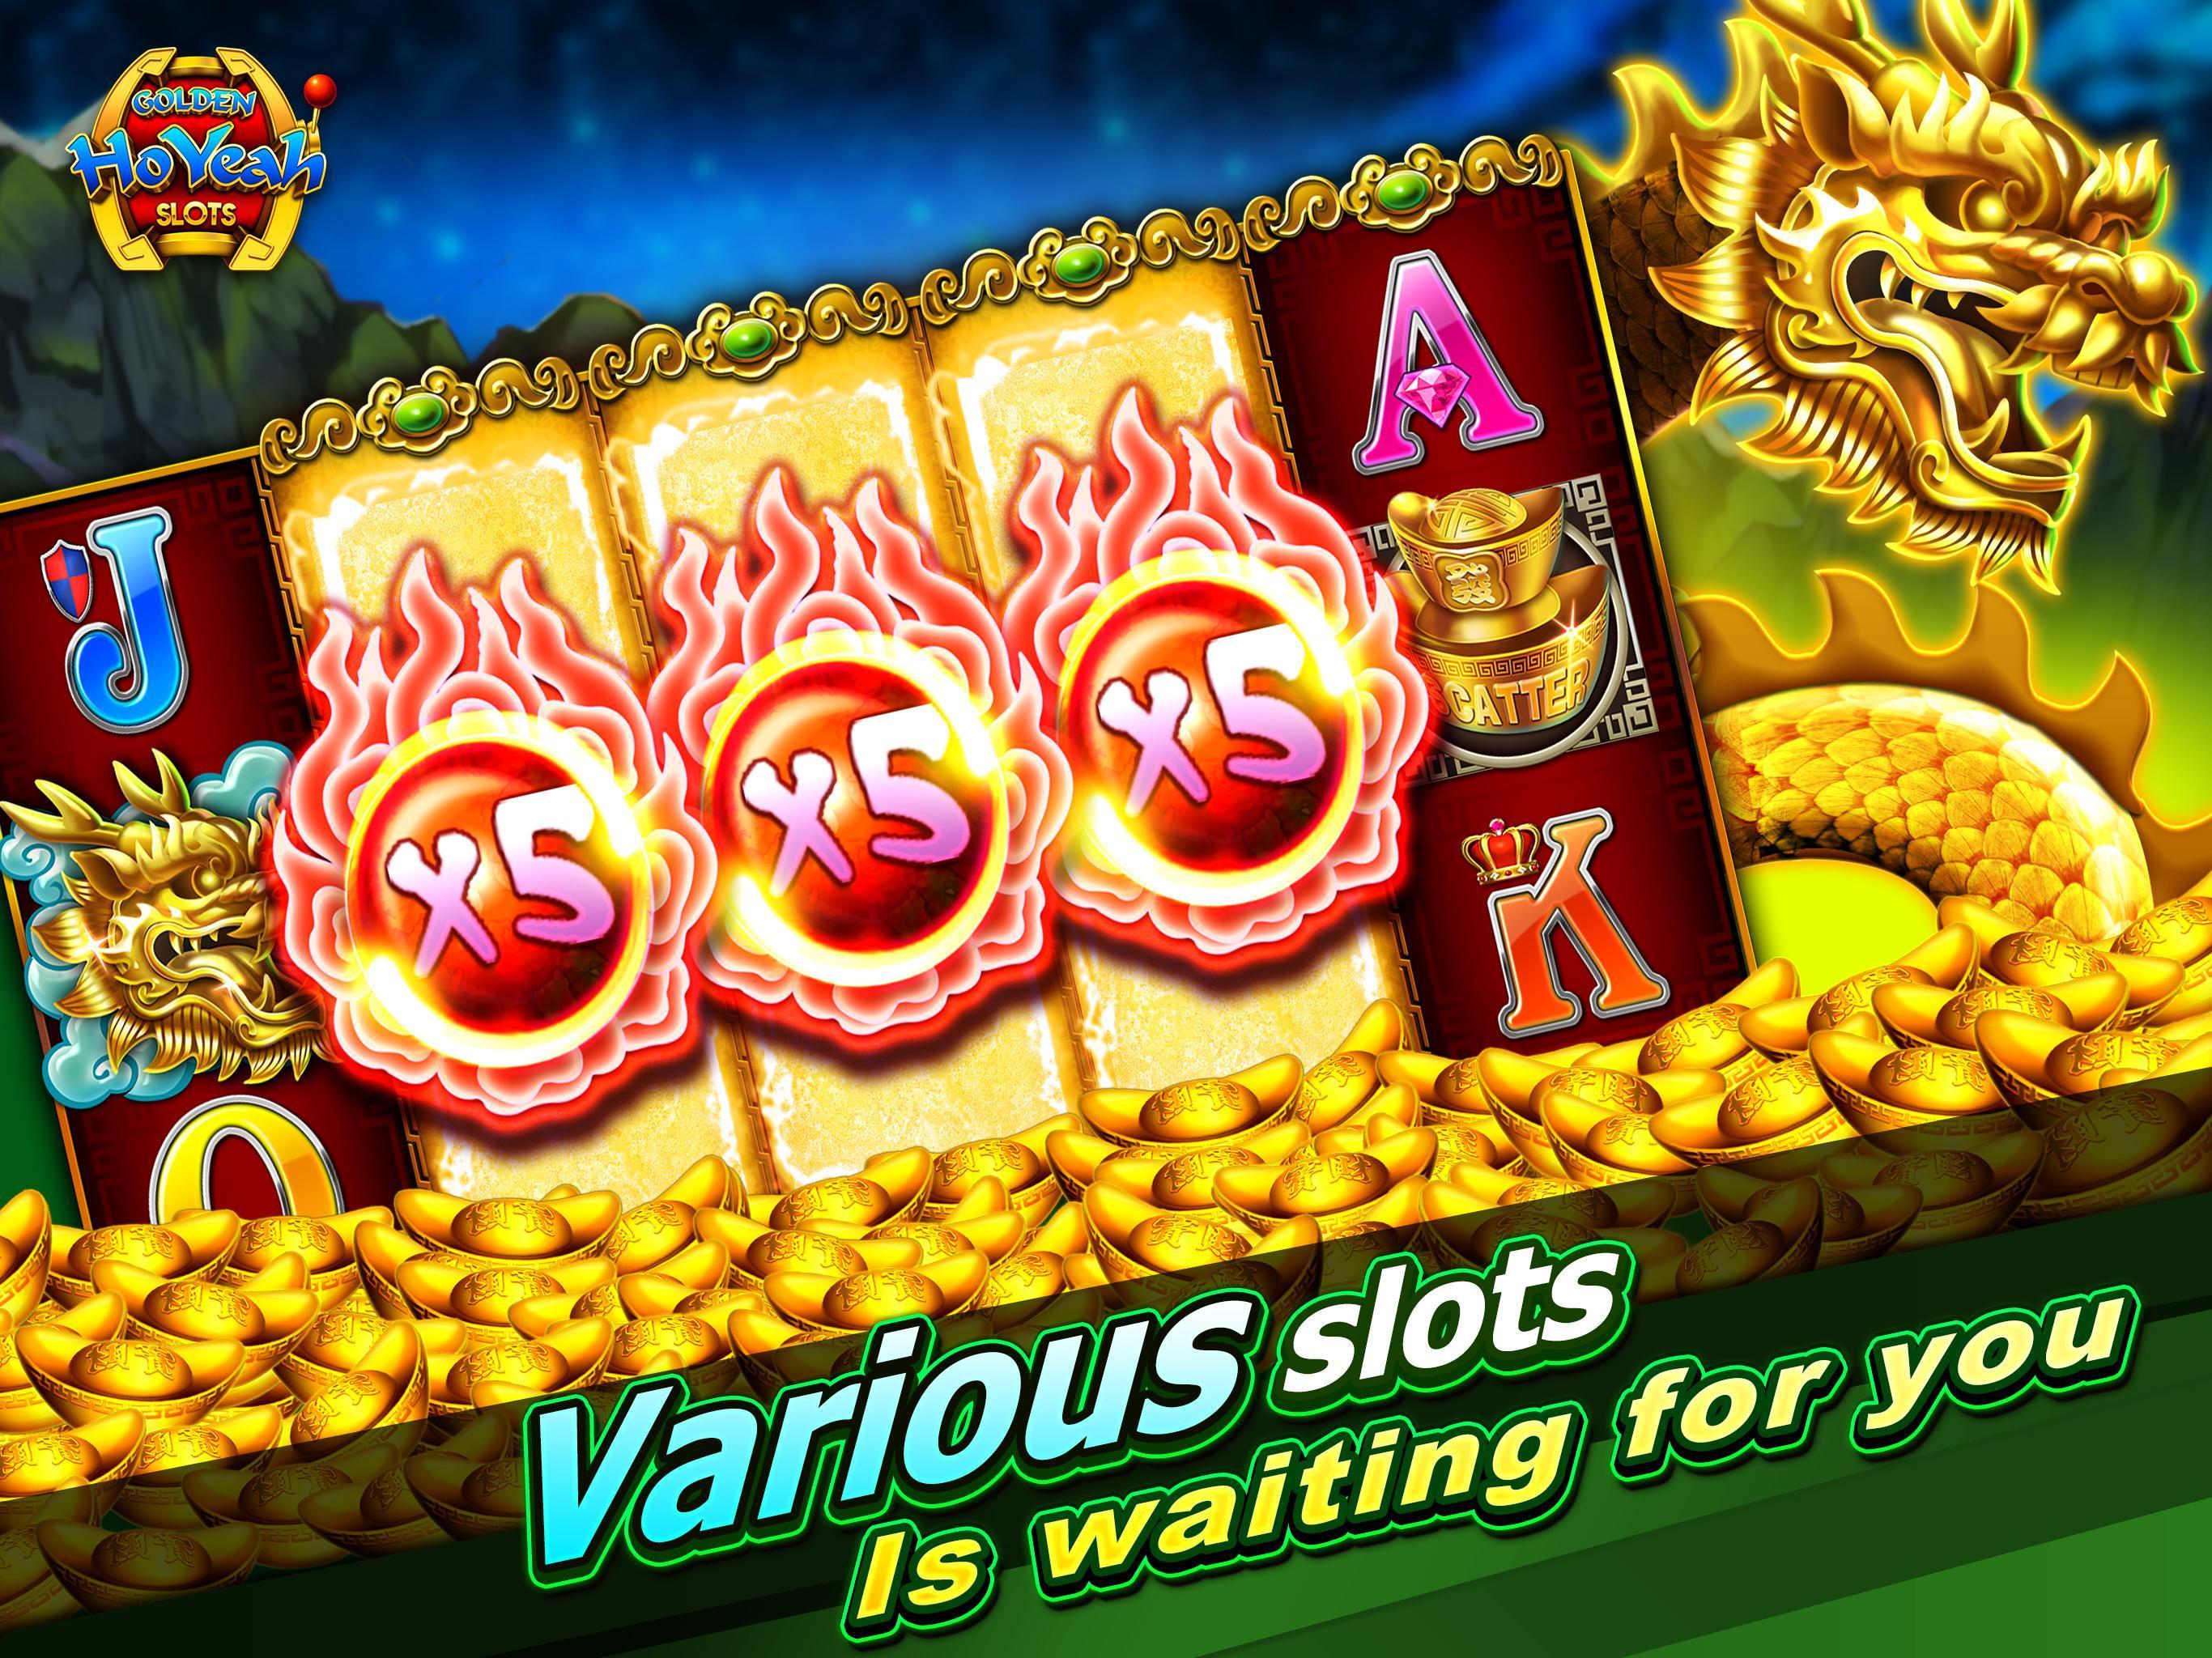 Slots (Golden HoYeah) - Casino Slots 2.5.7 Screenshot 5